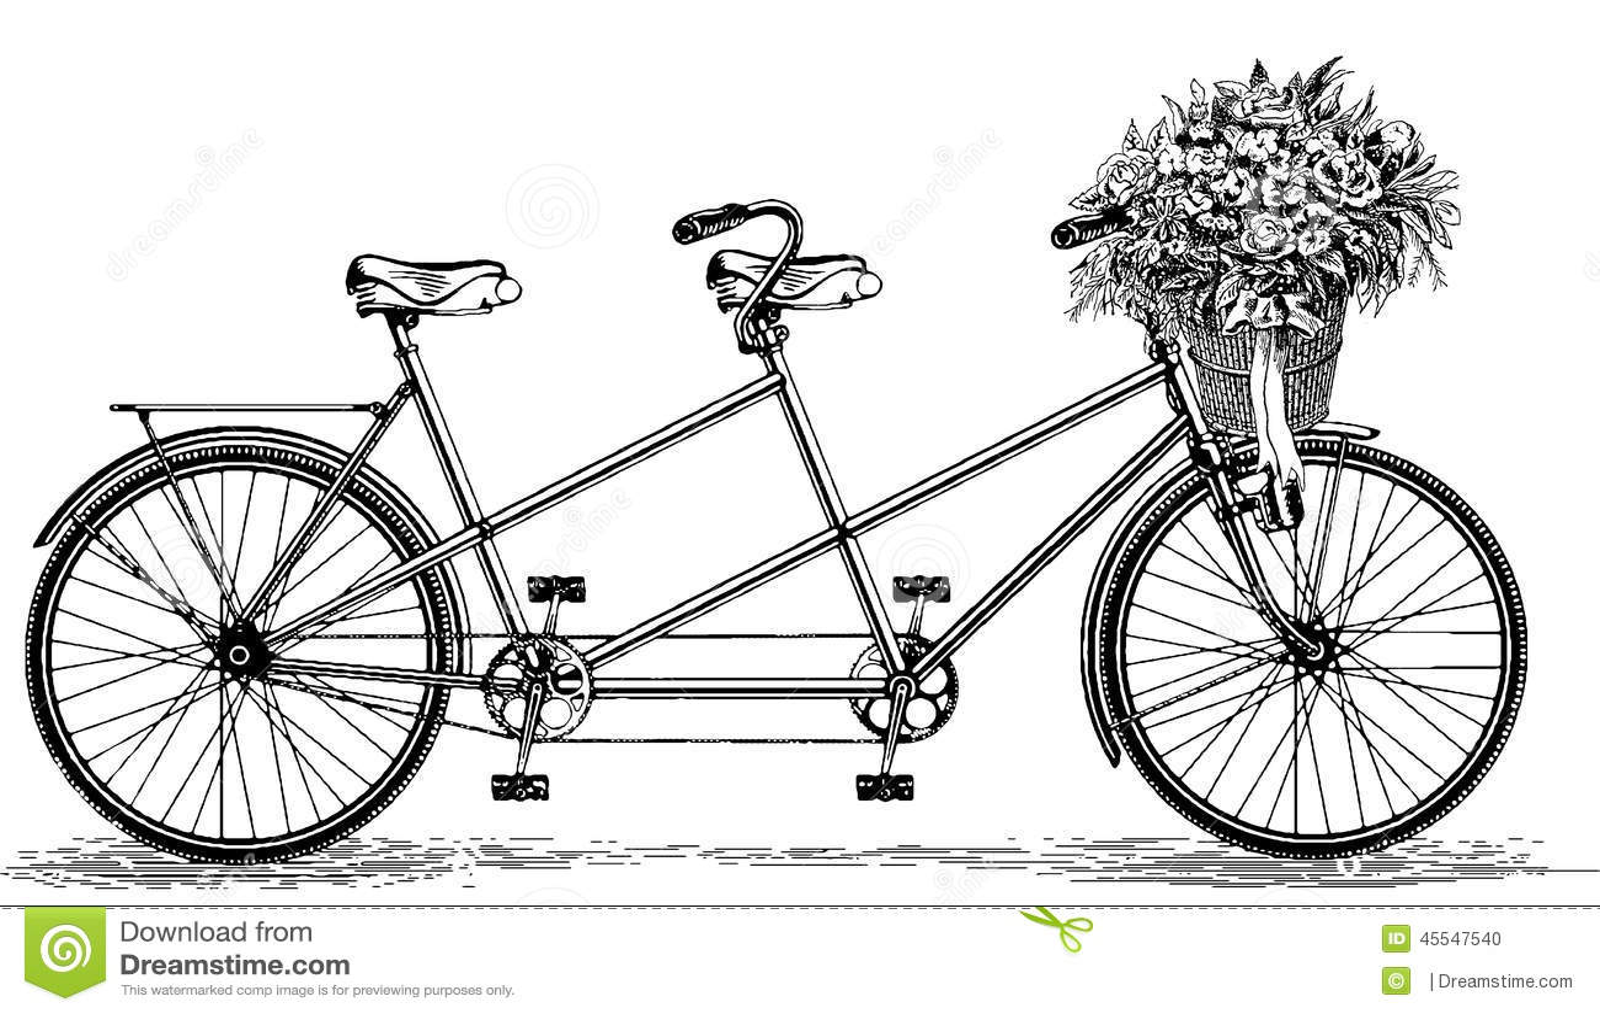 Vintage Illustration Tandem Bicycle Bike Cycle Stock Photo ...